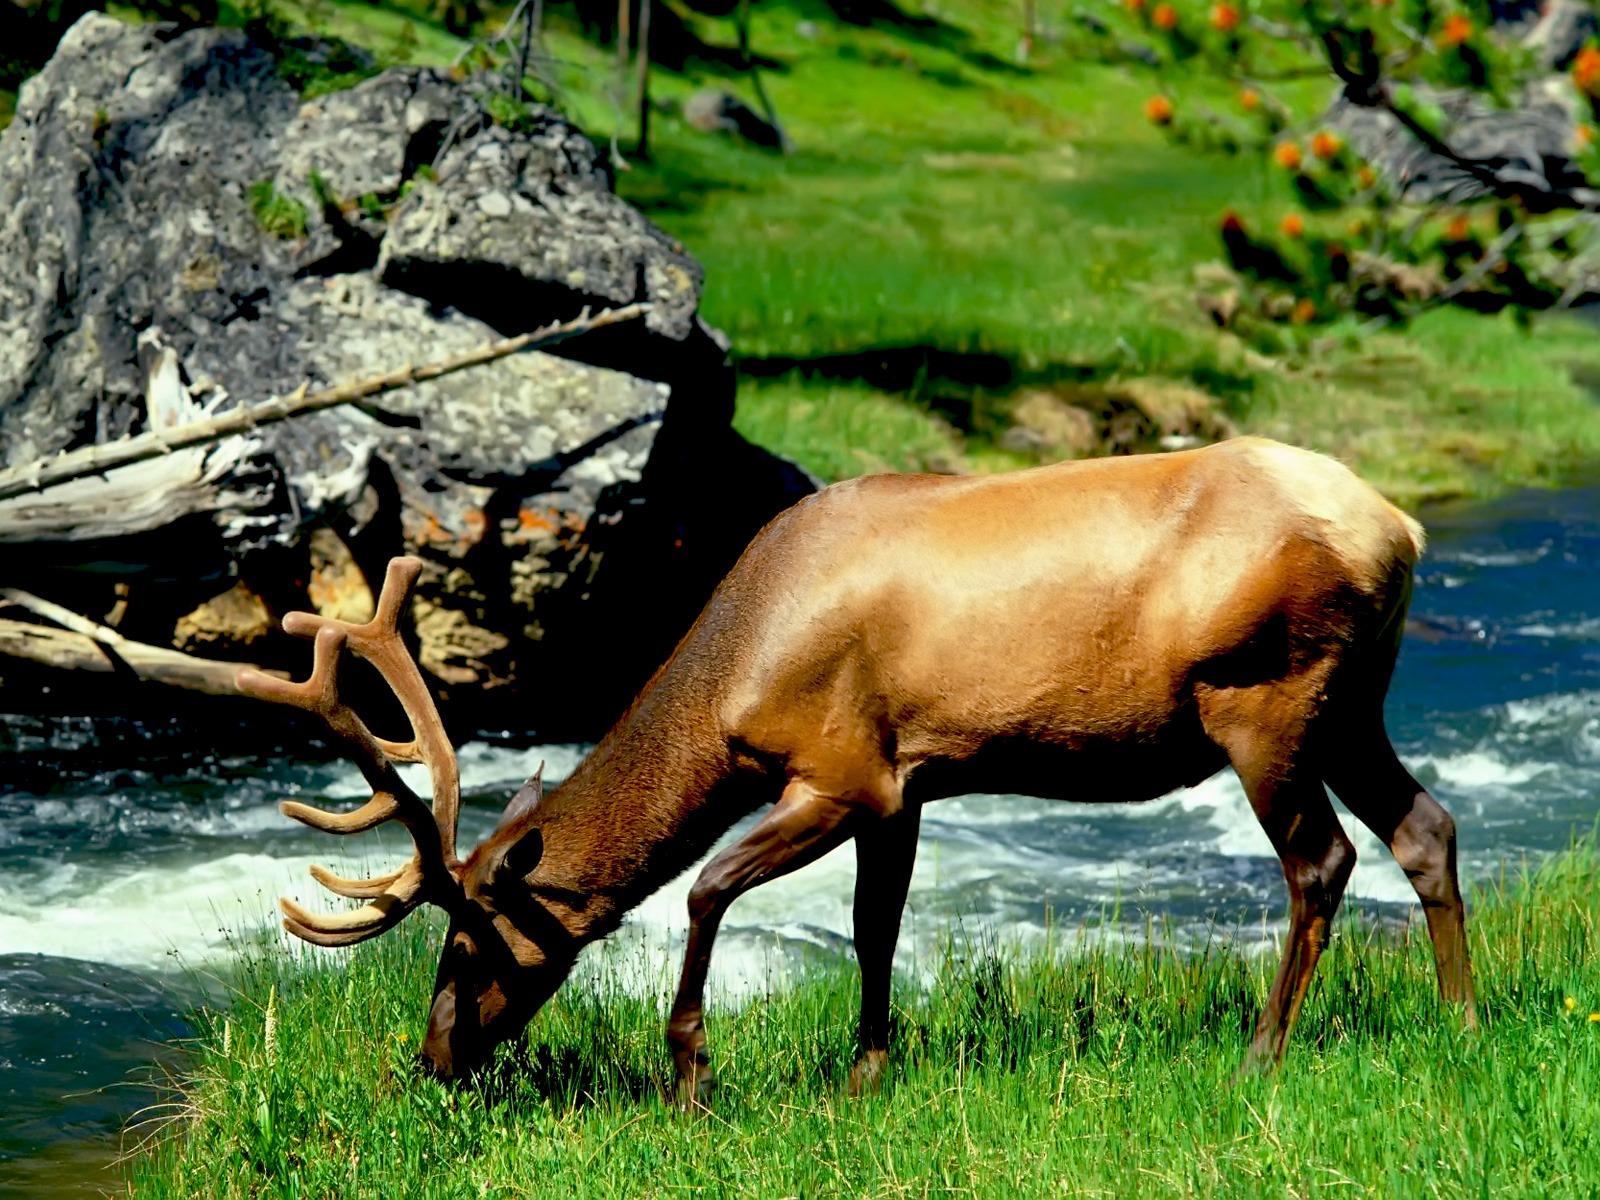 Download Wallpapers Wild Animals Wallpapers 1600x1200